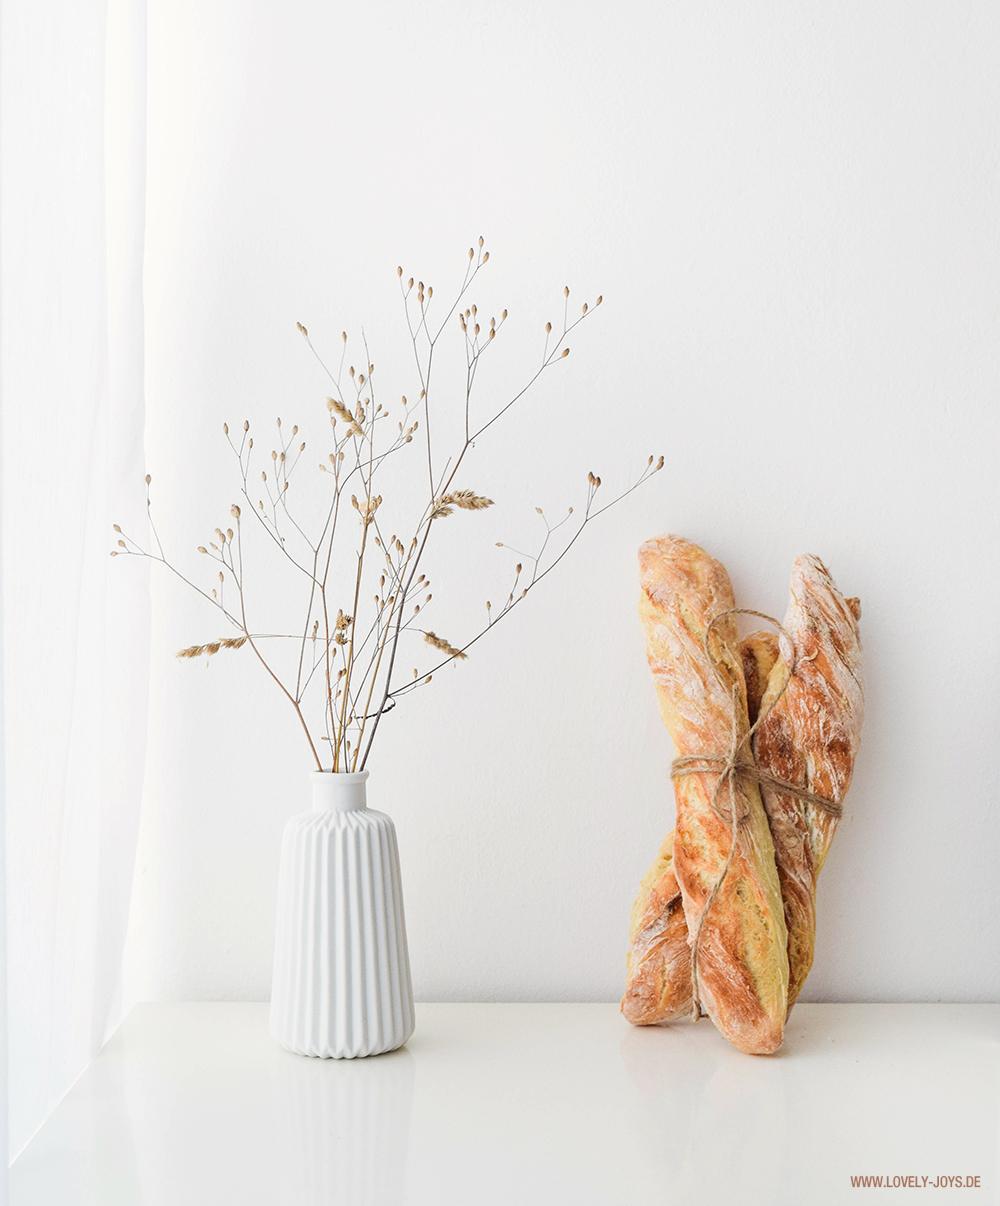 Baguettes Backen Rezept Paris Rusitkal skandinavisch Deko